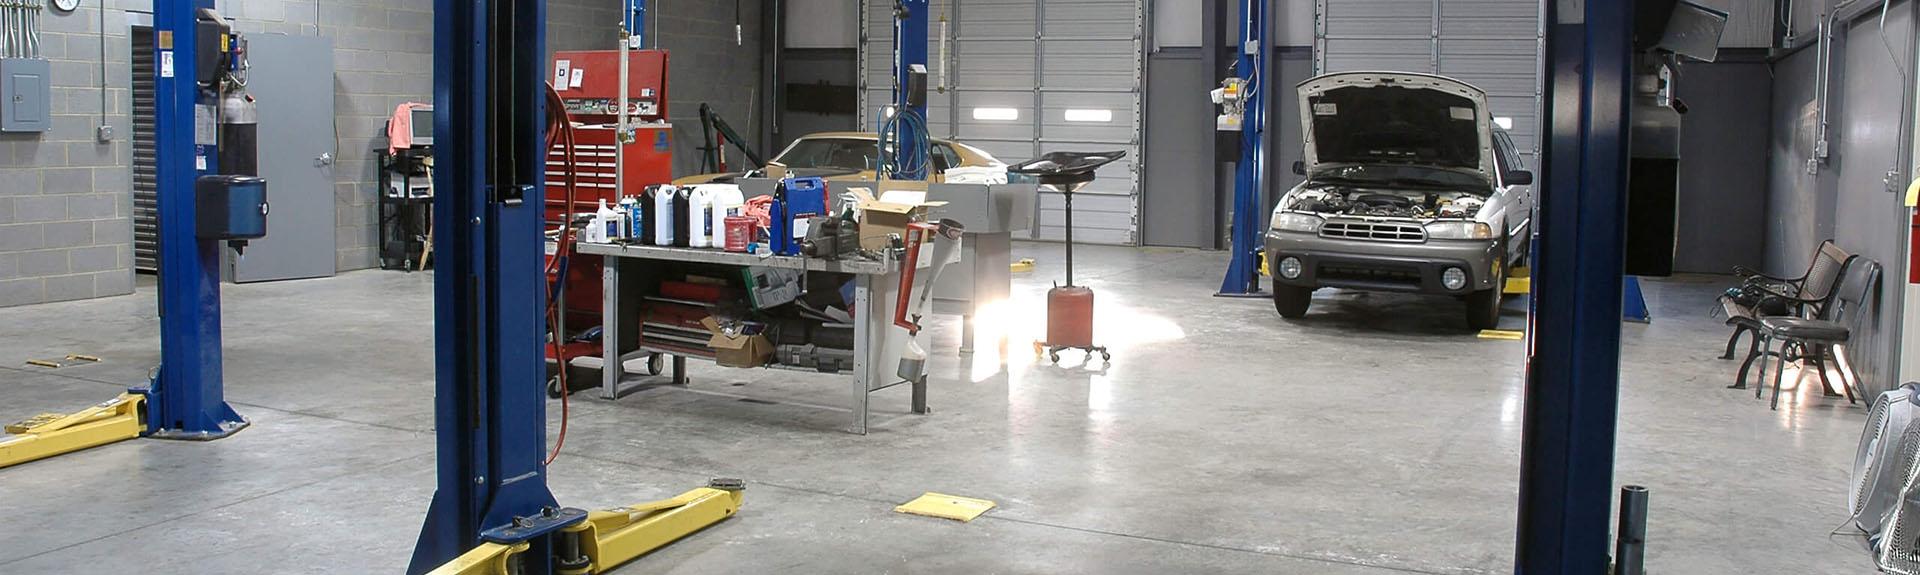 auto repair shop equipment colordao